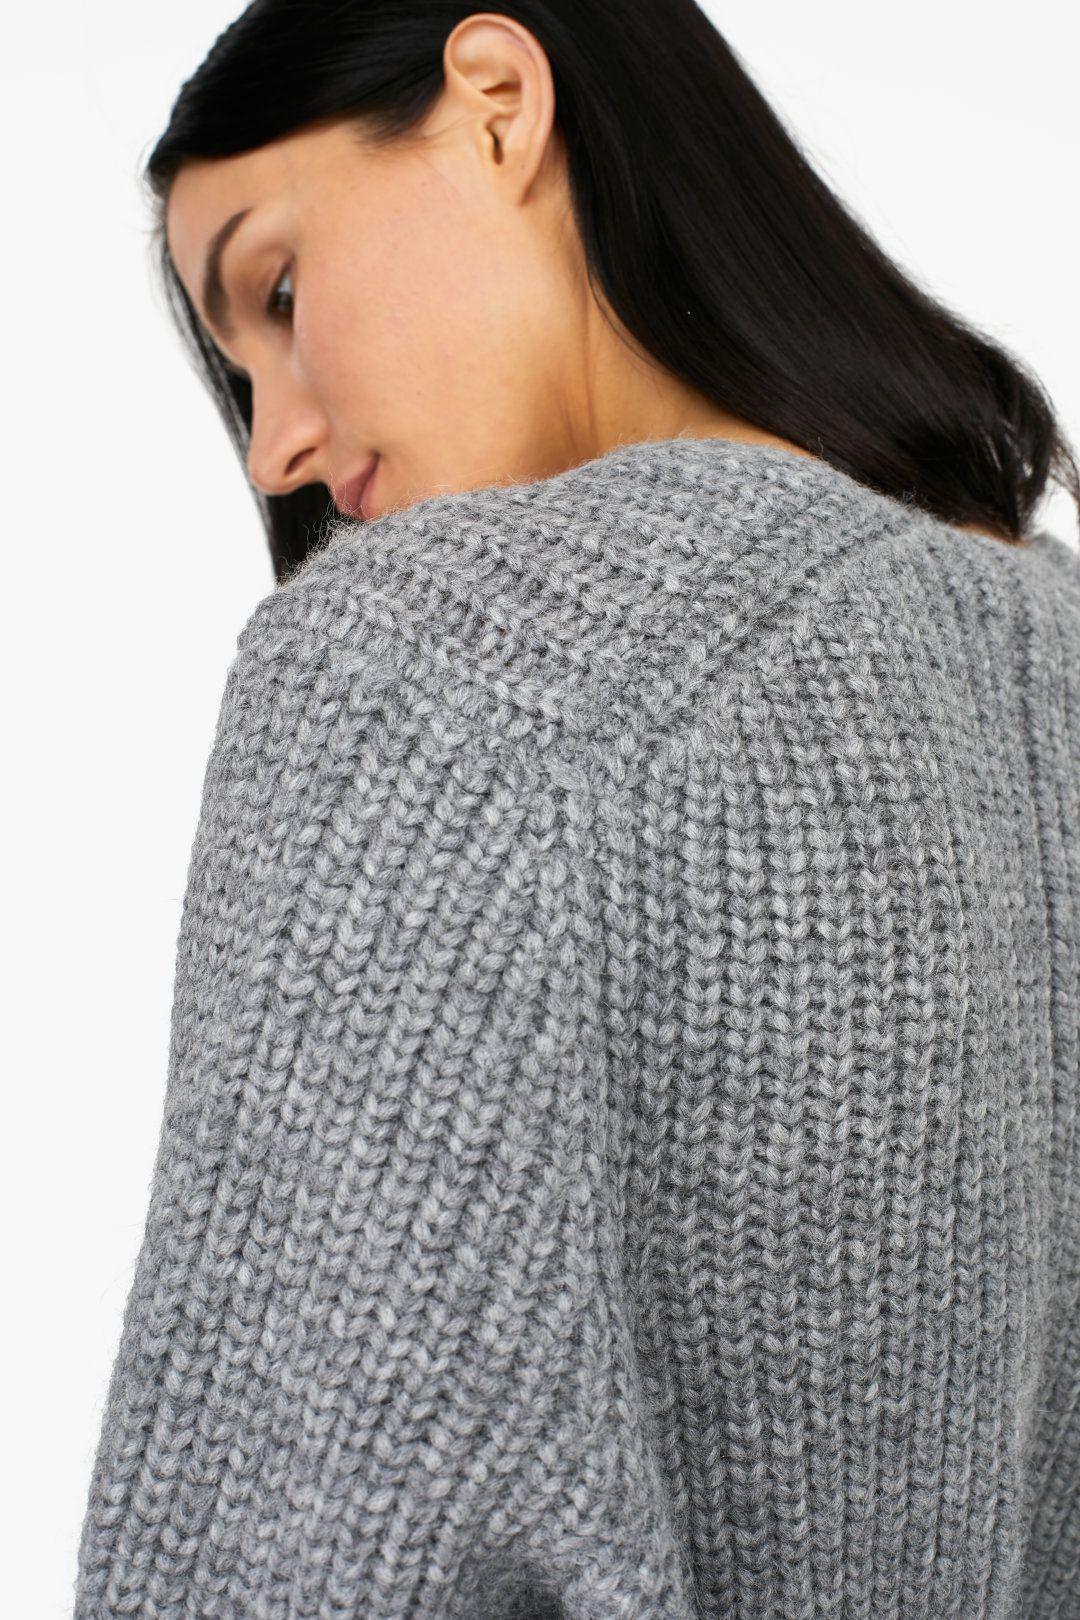 7aed1ec26da3 V-Sweater from Royal Baby Alpaca Mix